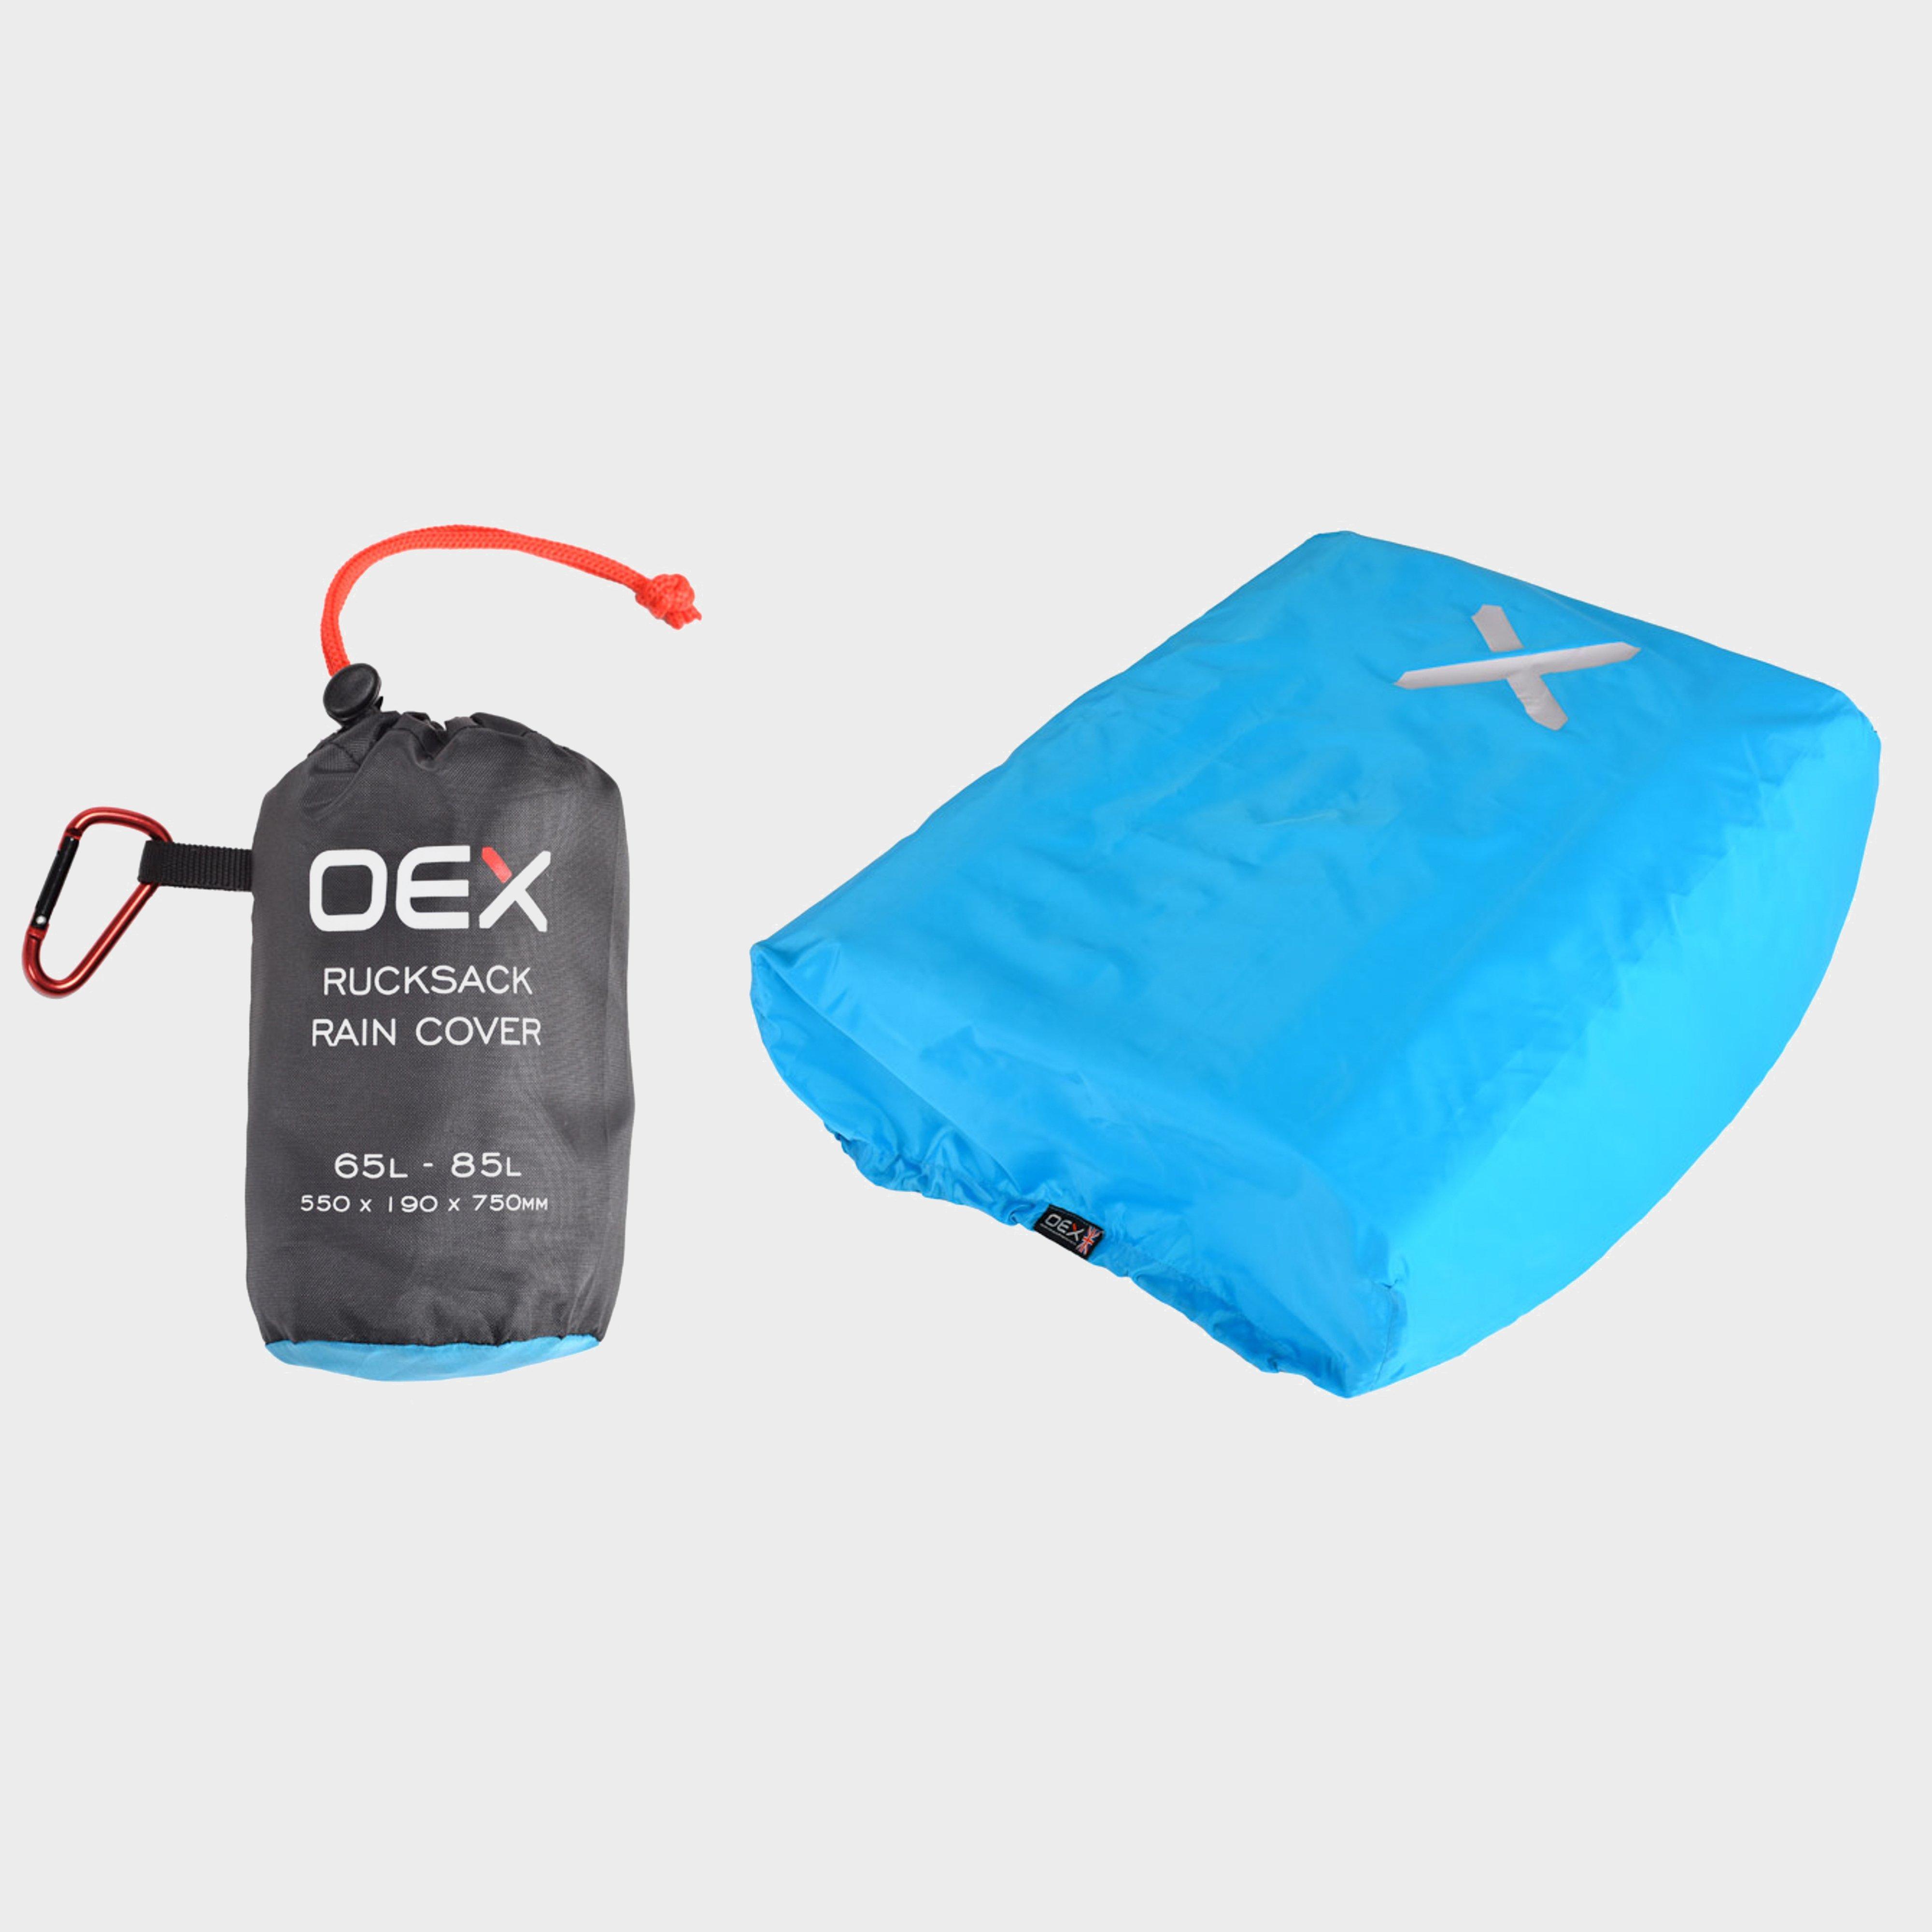 Oex Oex Rucksack Raincover (65L - 85L)